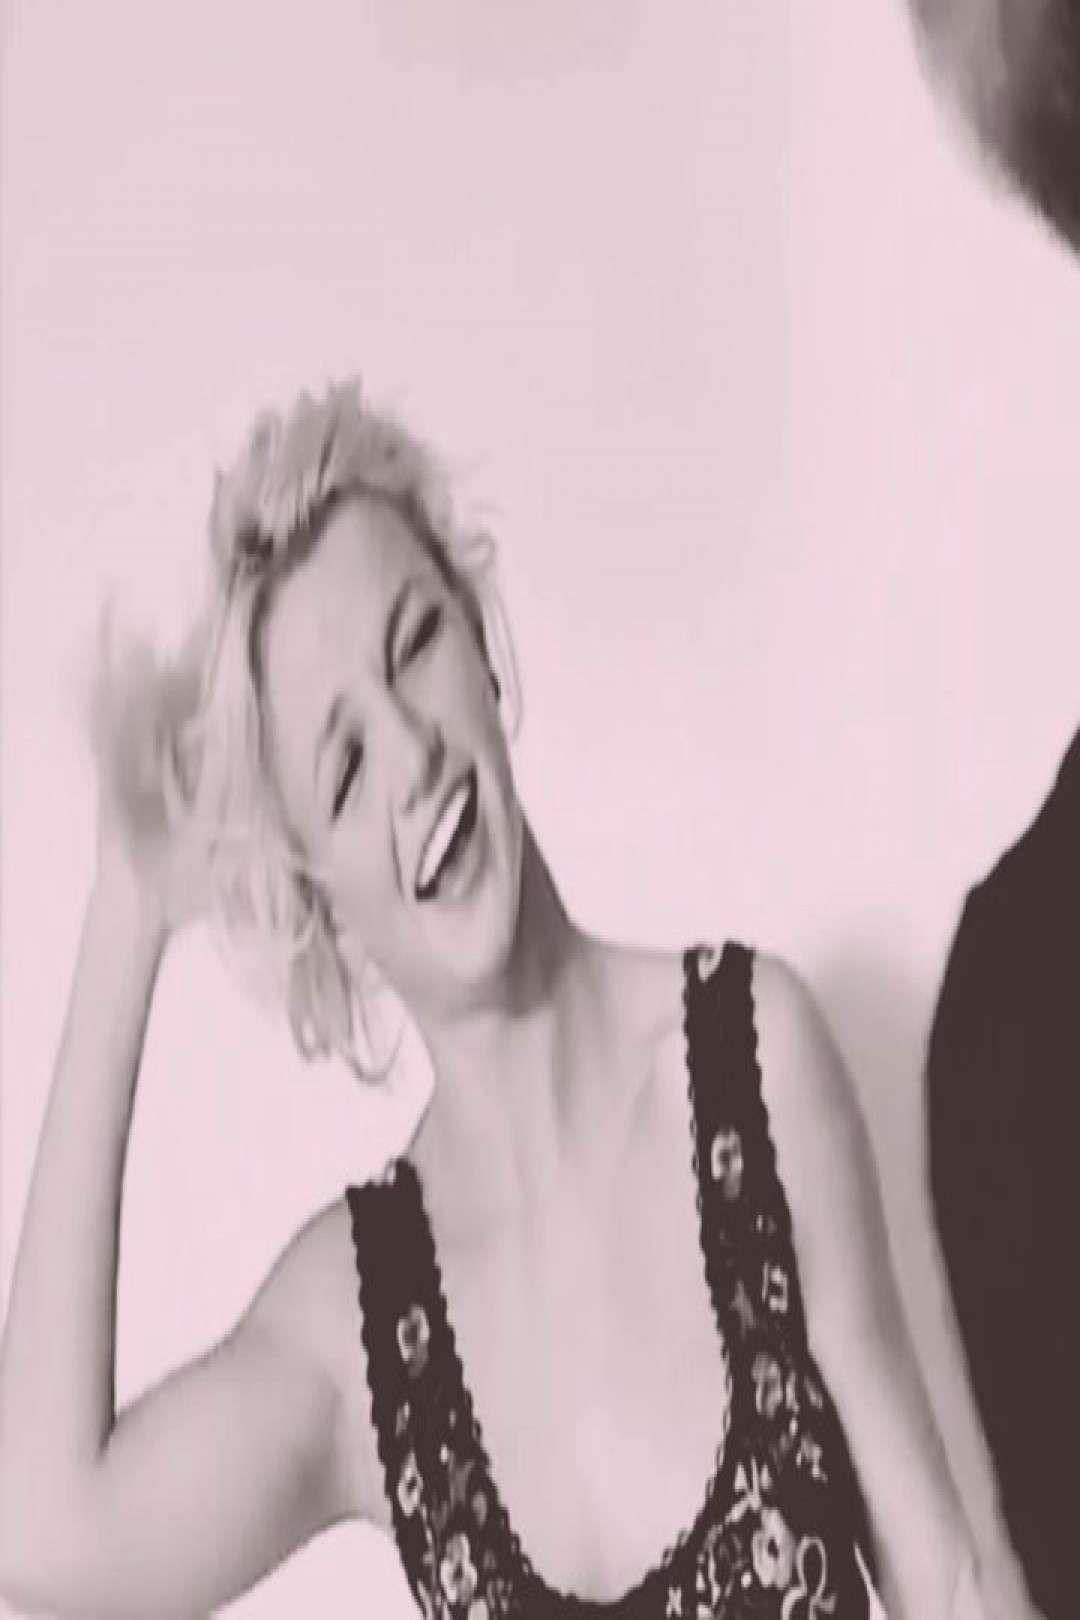 #britneyspears #vmagazine #vintage #fashion #white #kiss #from #one #you #00s #b One kiss from you britneyspears vintage fashion white 00s bYou can find V magazine and more on our website.One kiss from you britneyspears vintage fashion white 00s b